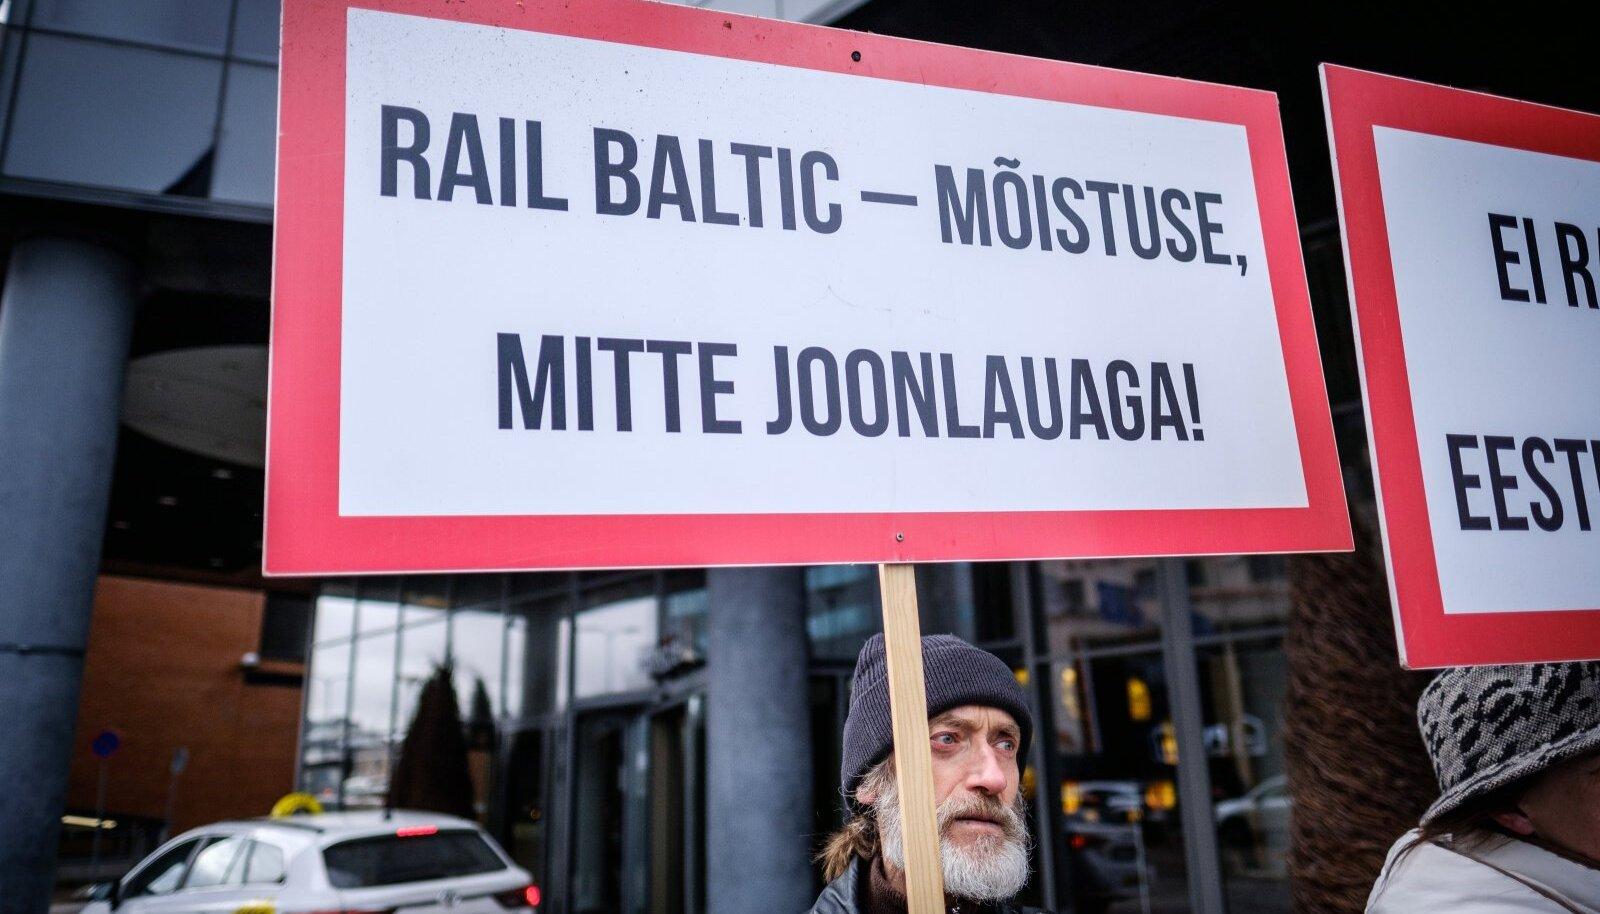 Rail Balticu vastane protest Swissoteli ees 10.04.2018